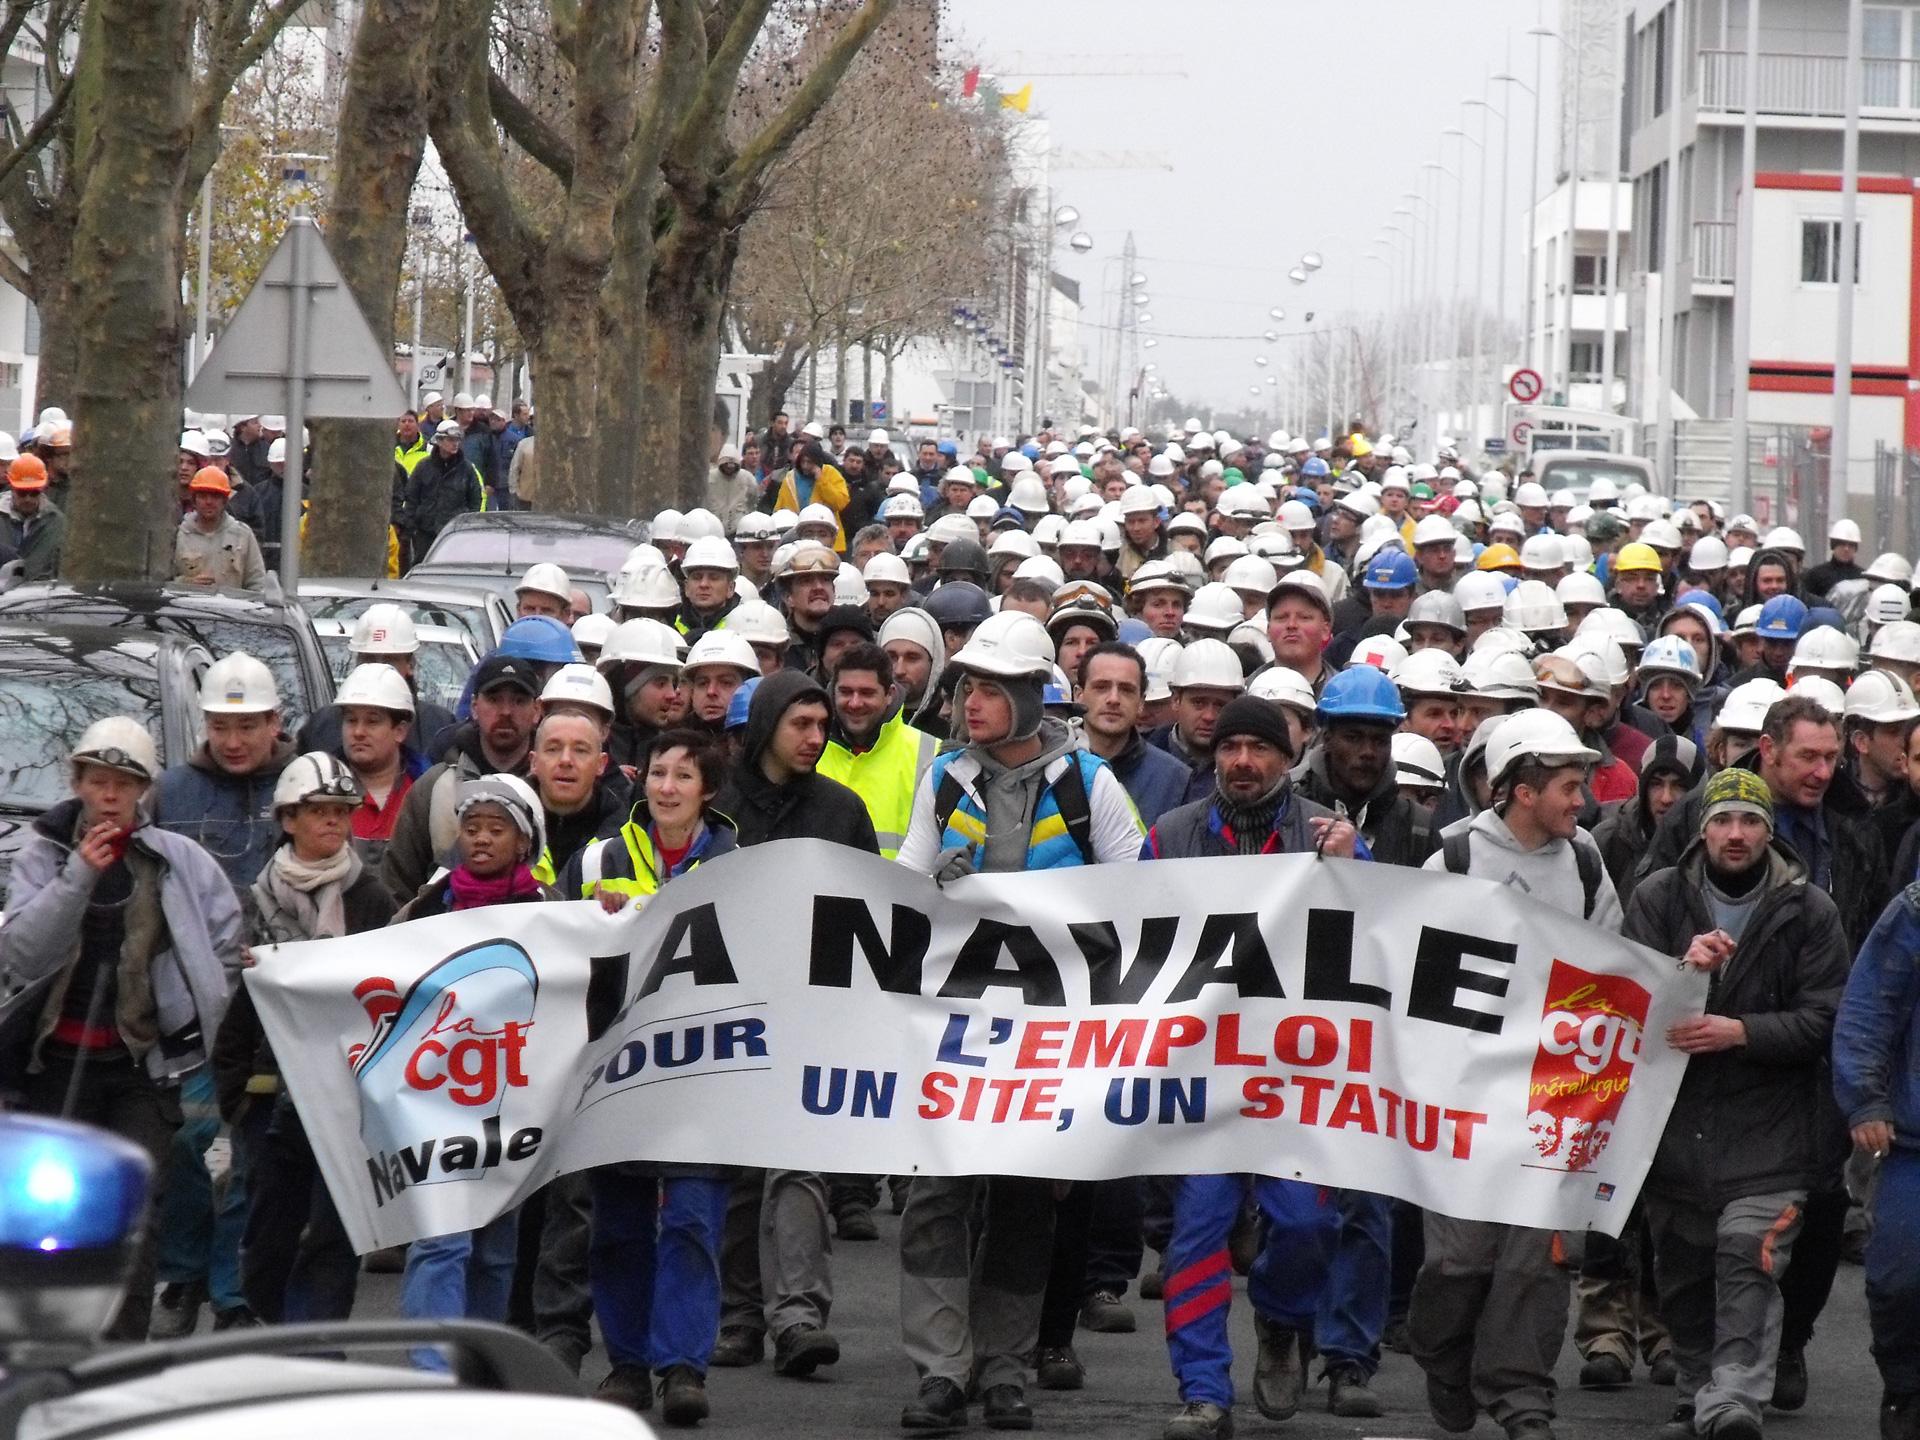 la_navale